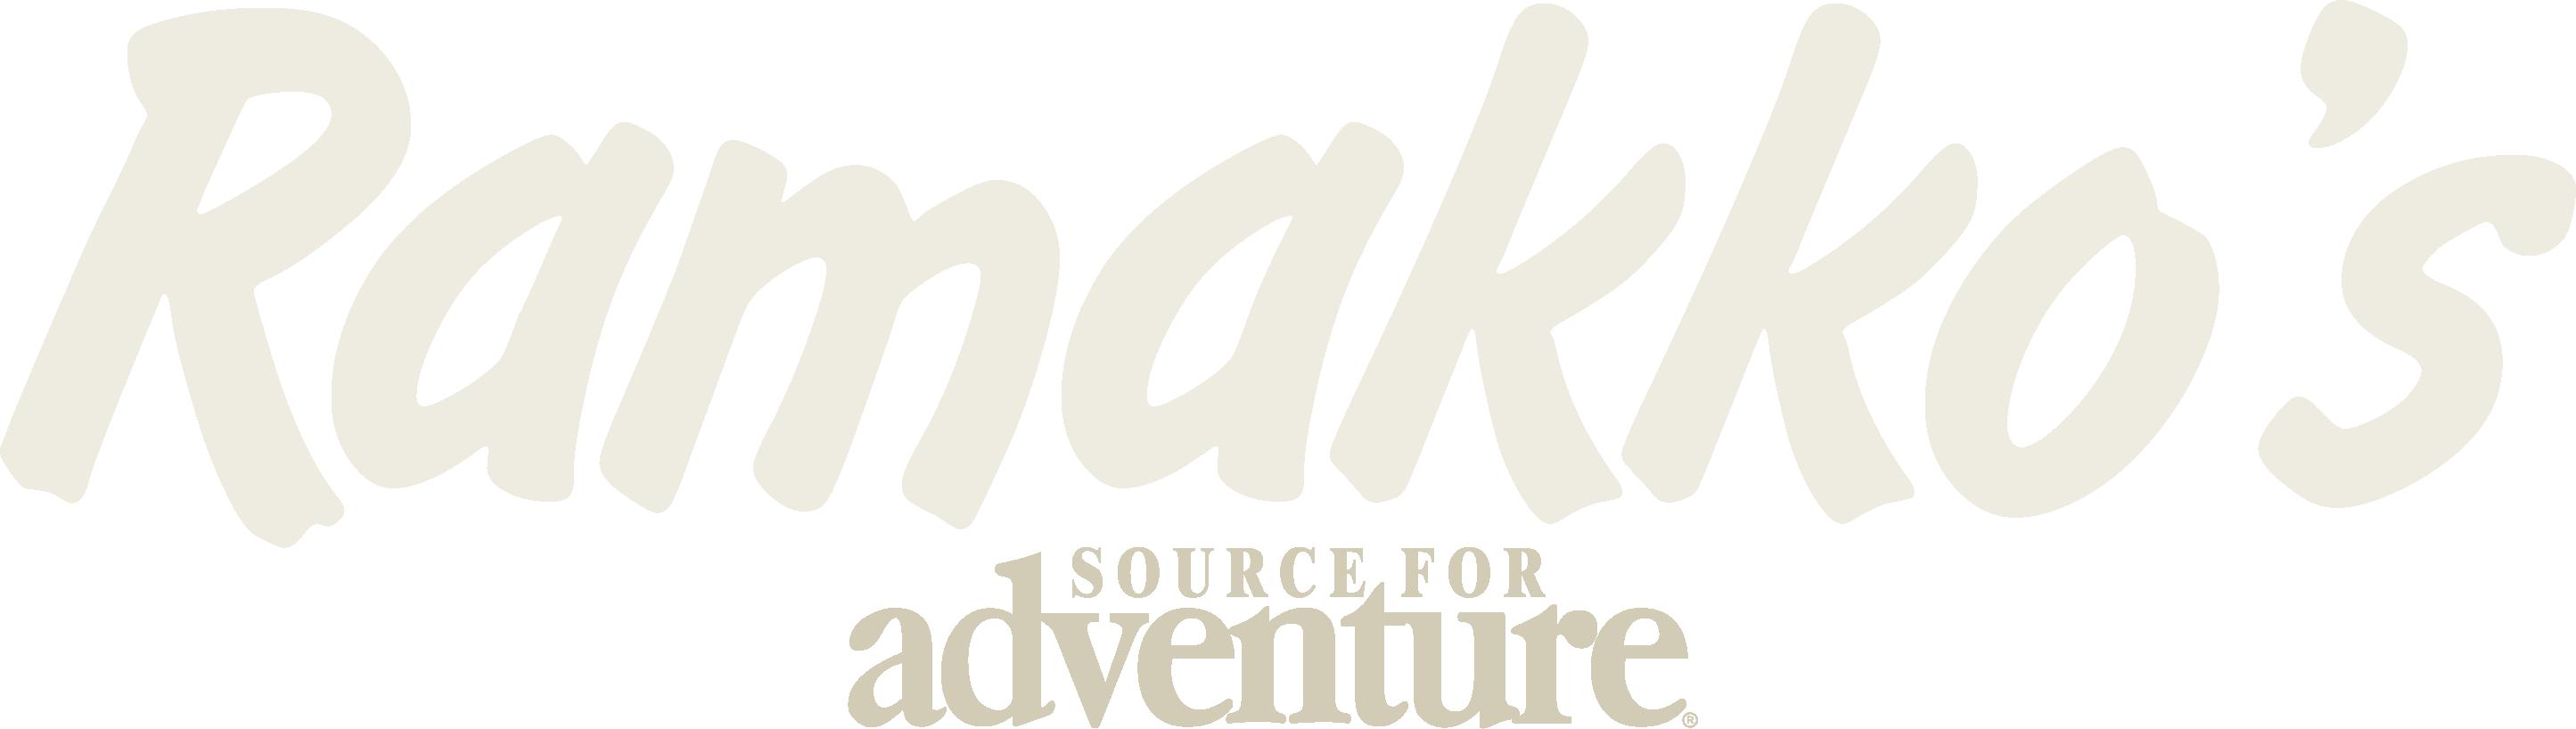 Ramakko's Source for Adventure